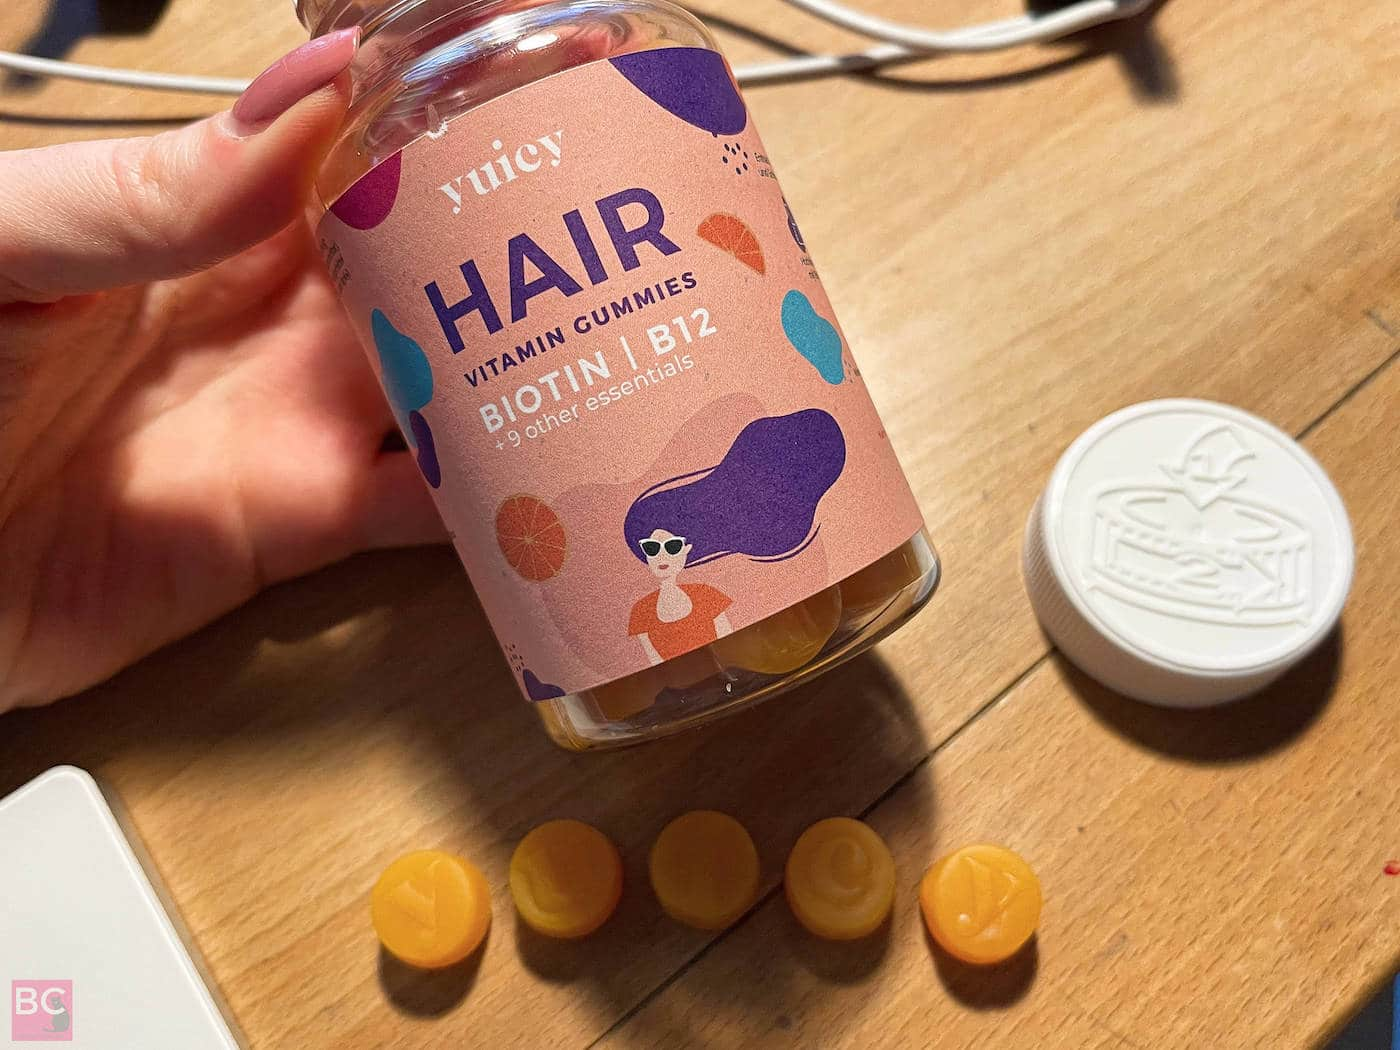 YUICY Vitamingummies Erfahrungen HAARE Hair Vitamin Gums